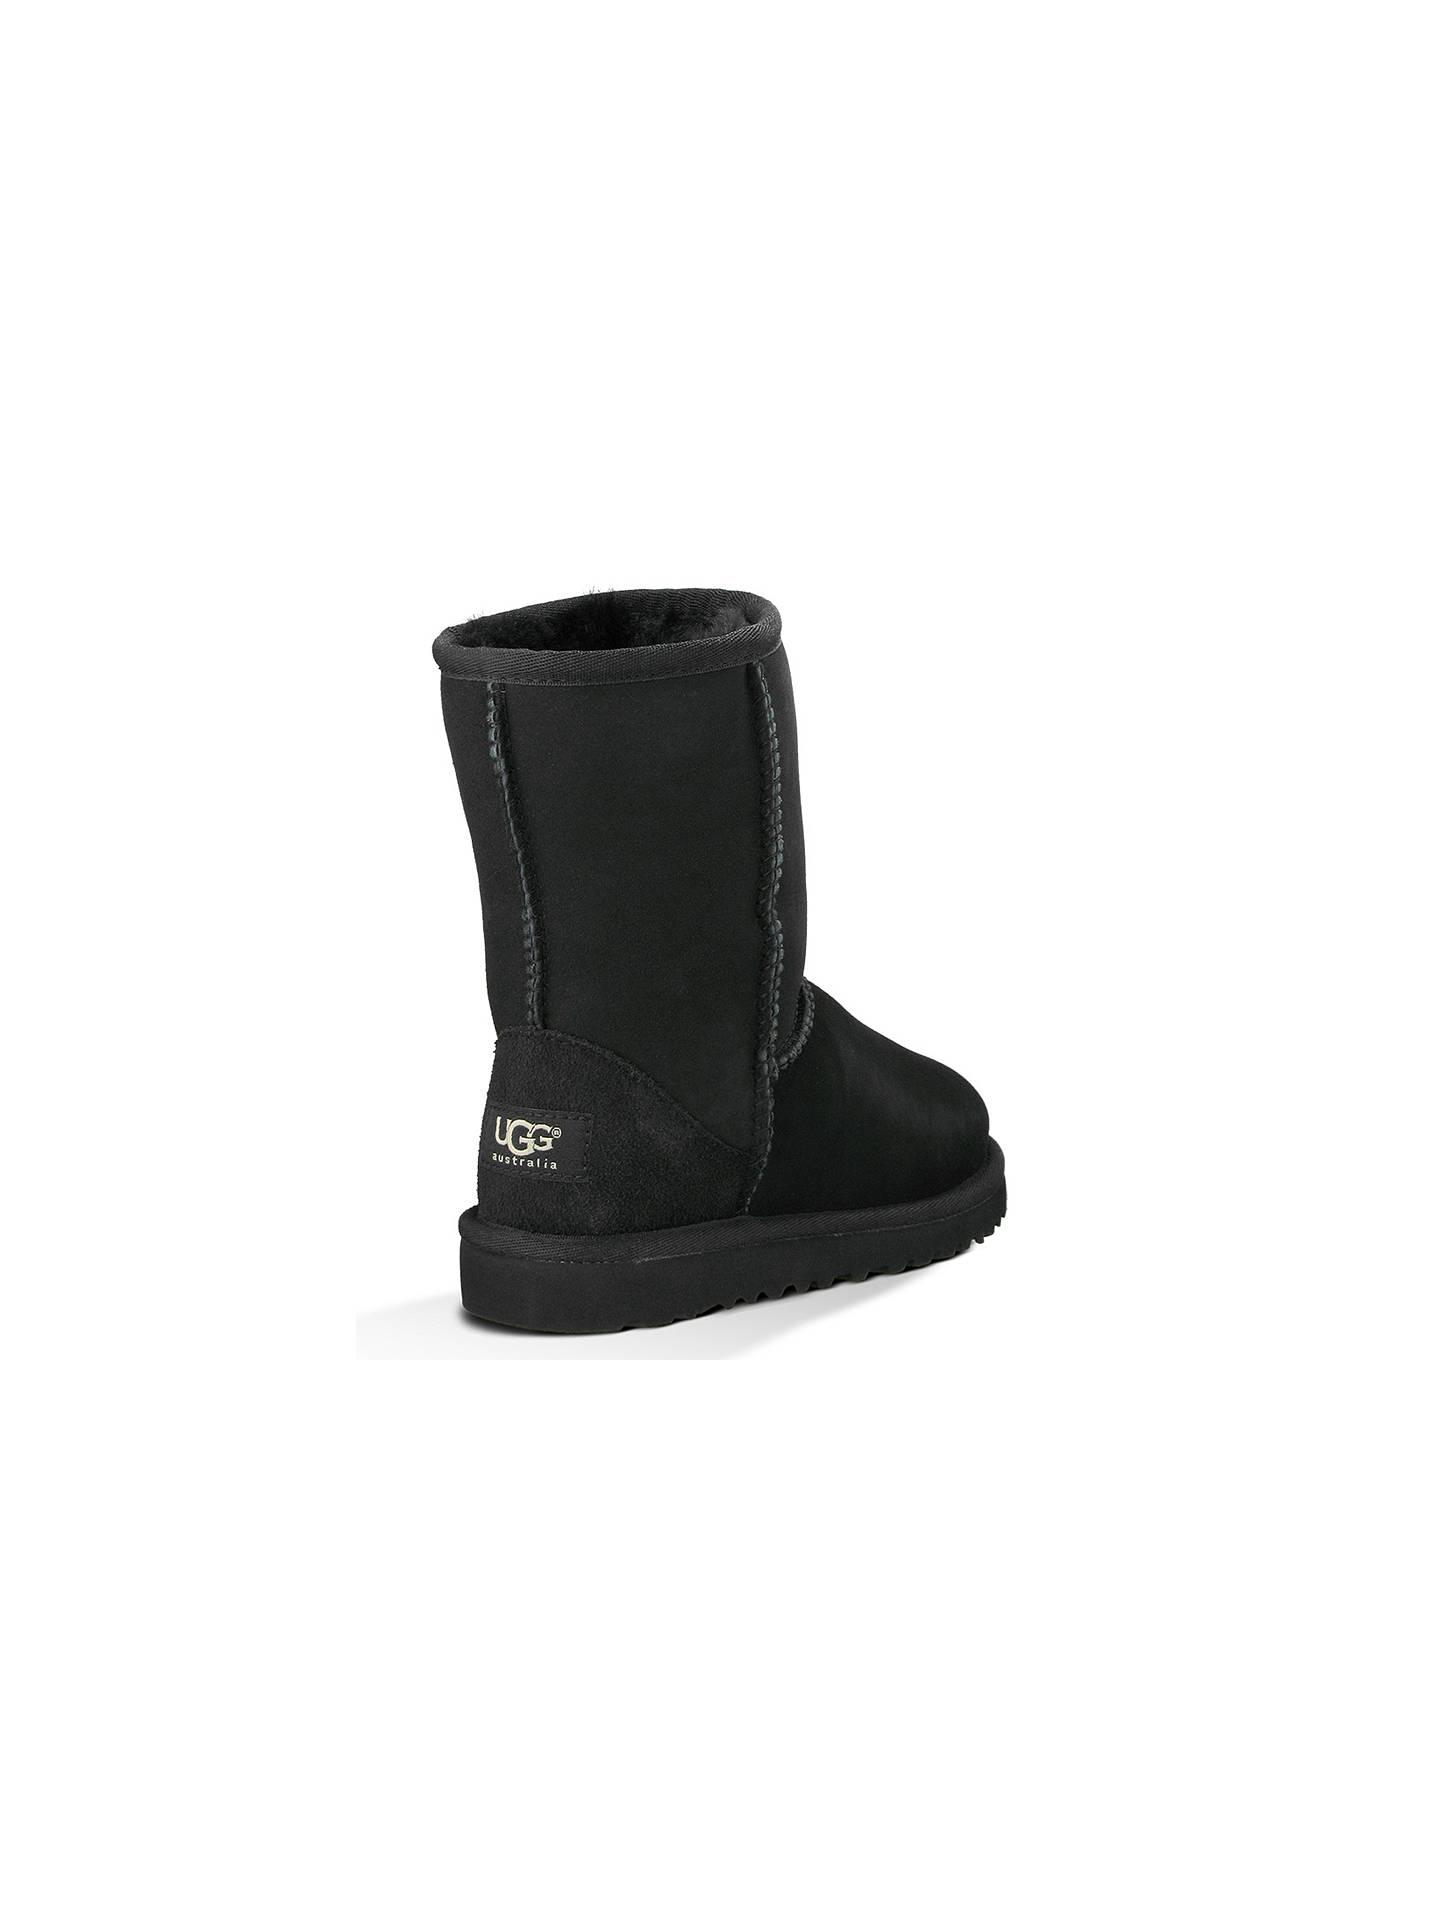 3224b5c1bf0 UGG Children's Classic Short Boots, Black at John Lewis & Partners